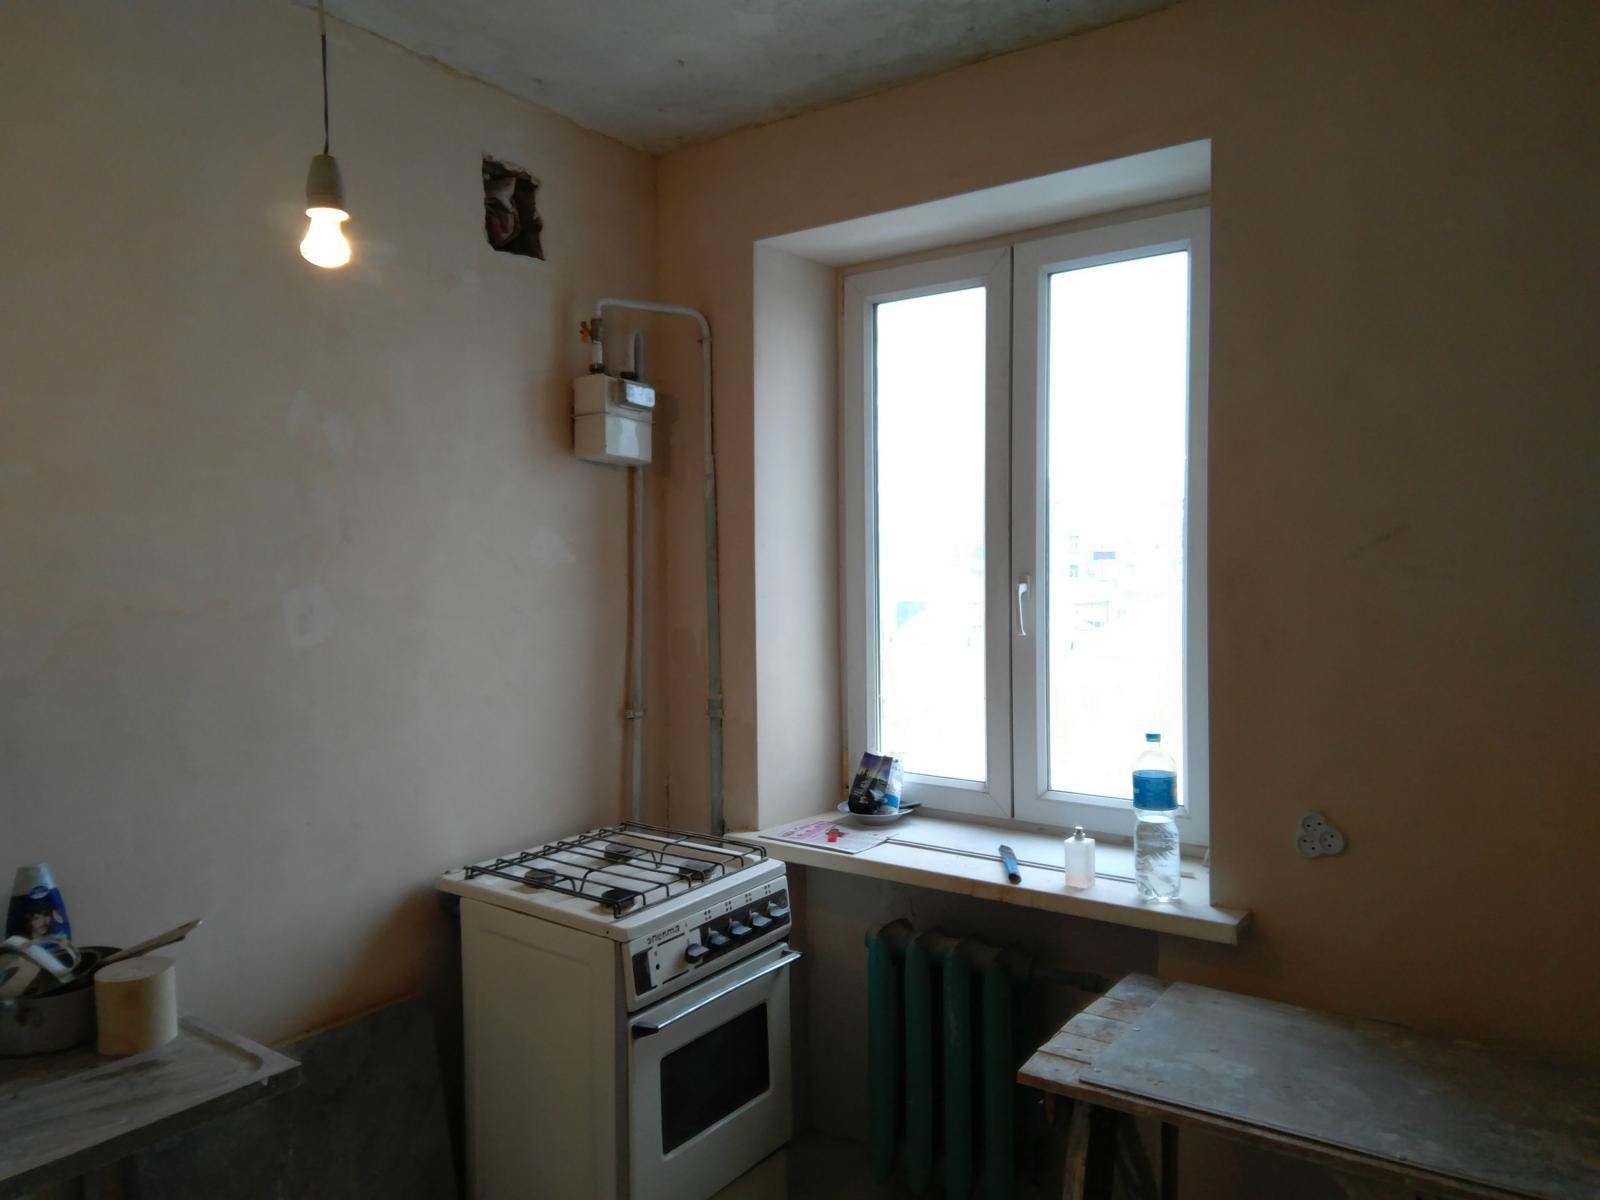 Продам квартиру Днепропетровск, Курчатова ул. 5